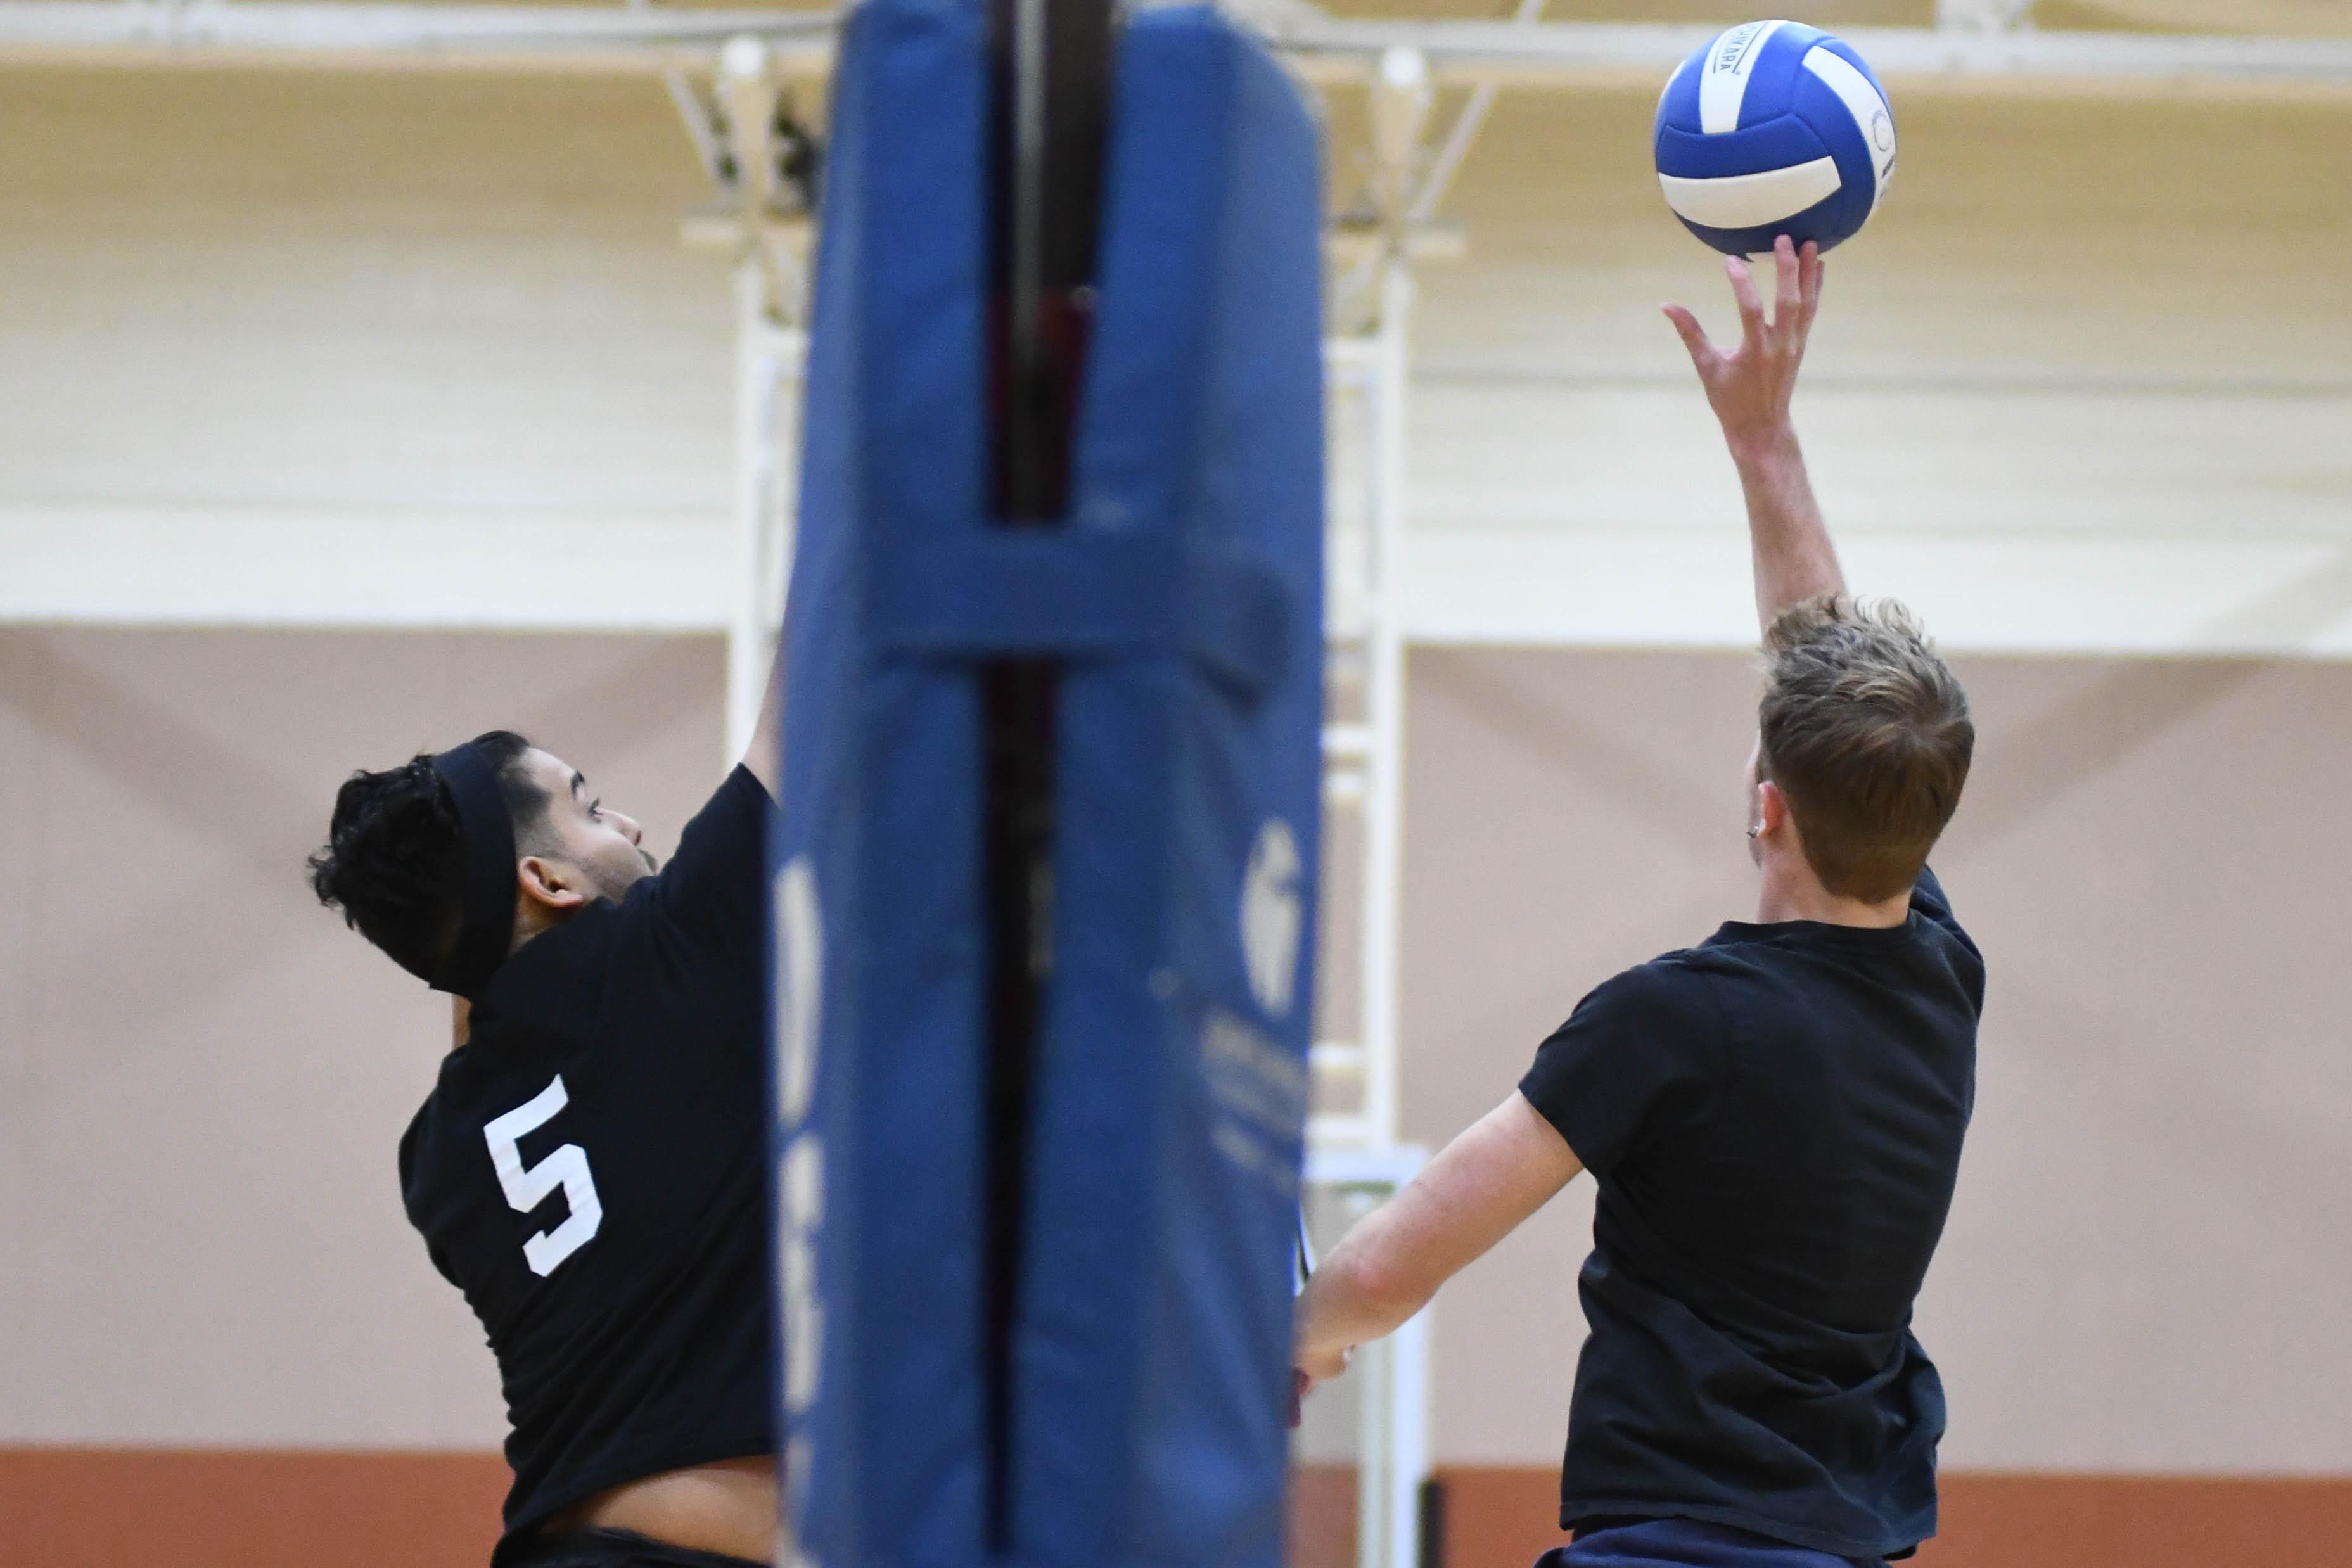 Volleyball kicks off intramurals